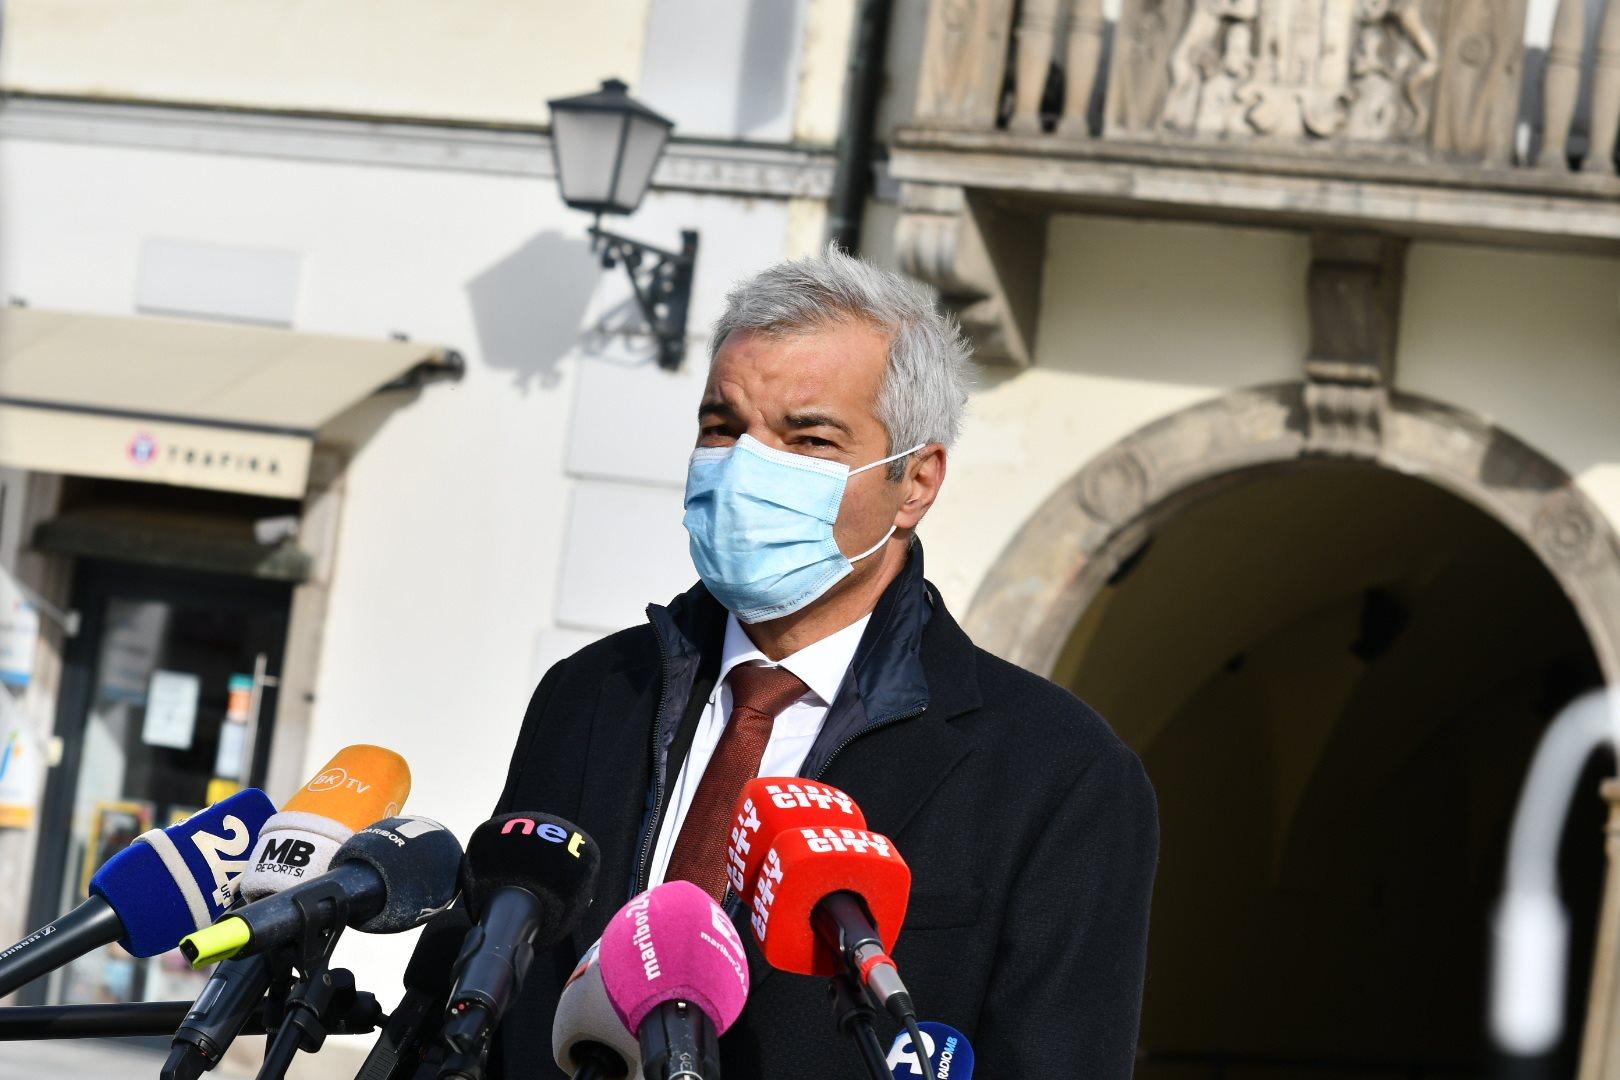 Mariborski župan Saša Arsenovič je občane Maribora pozval k nošenju zaščitnih mask.